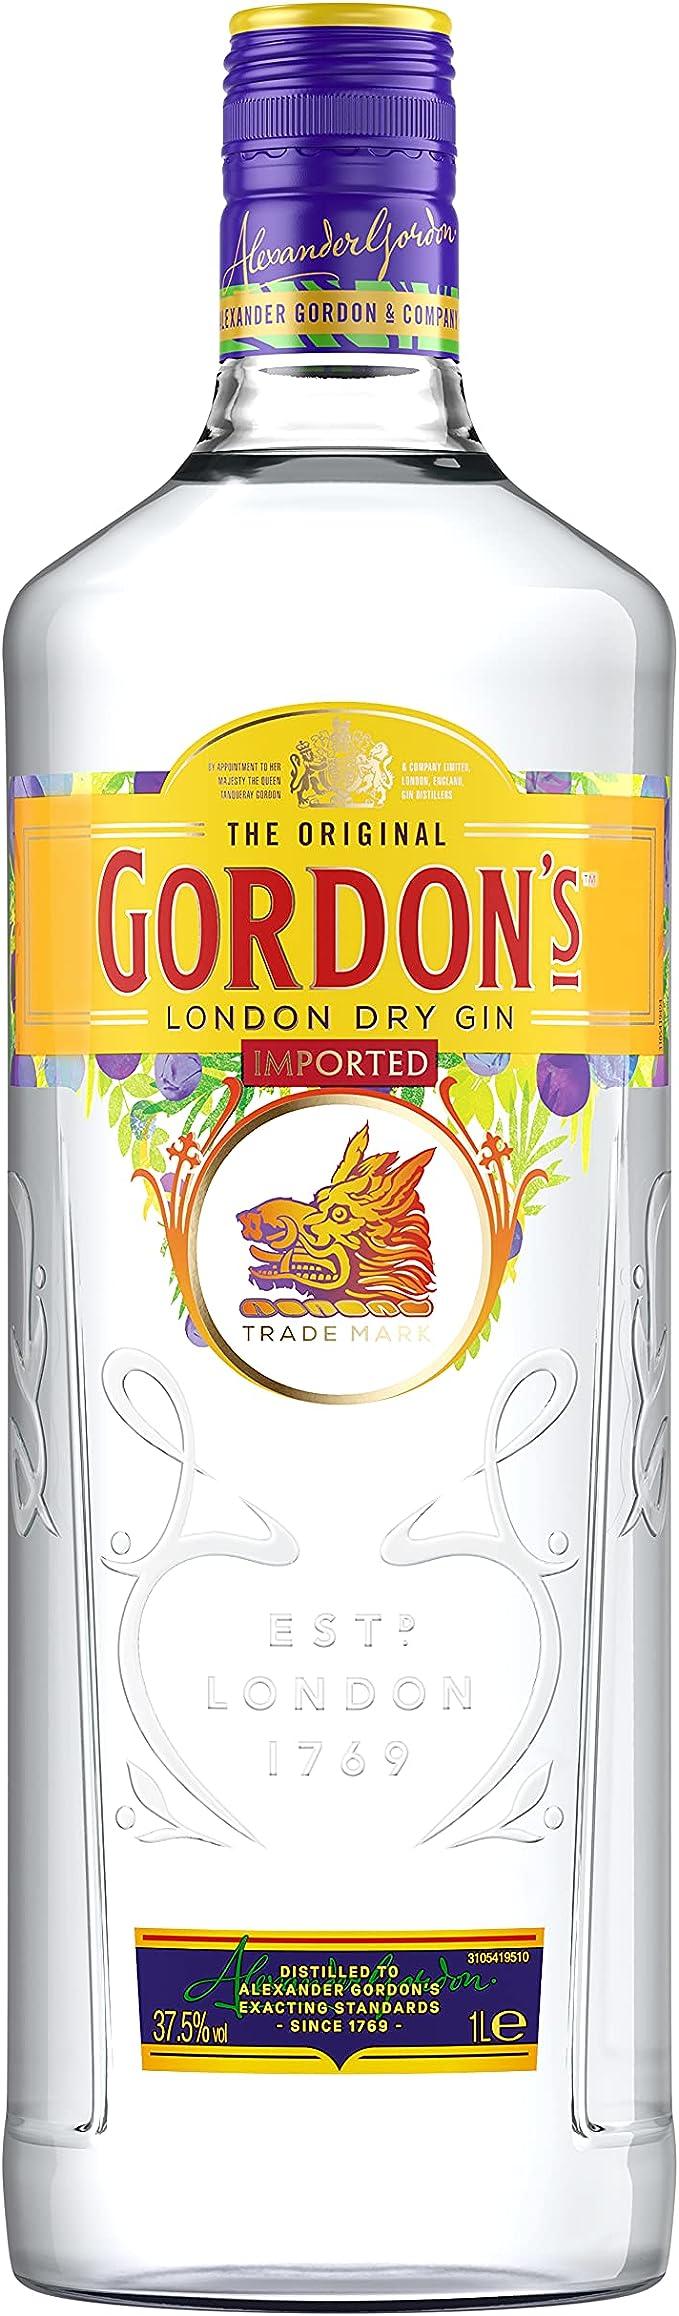 141 opinioni per Gordon's London Dry Gin- 1 L